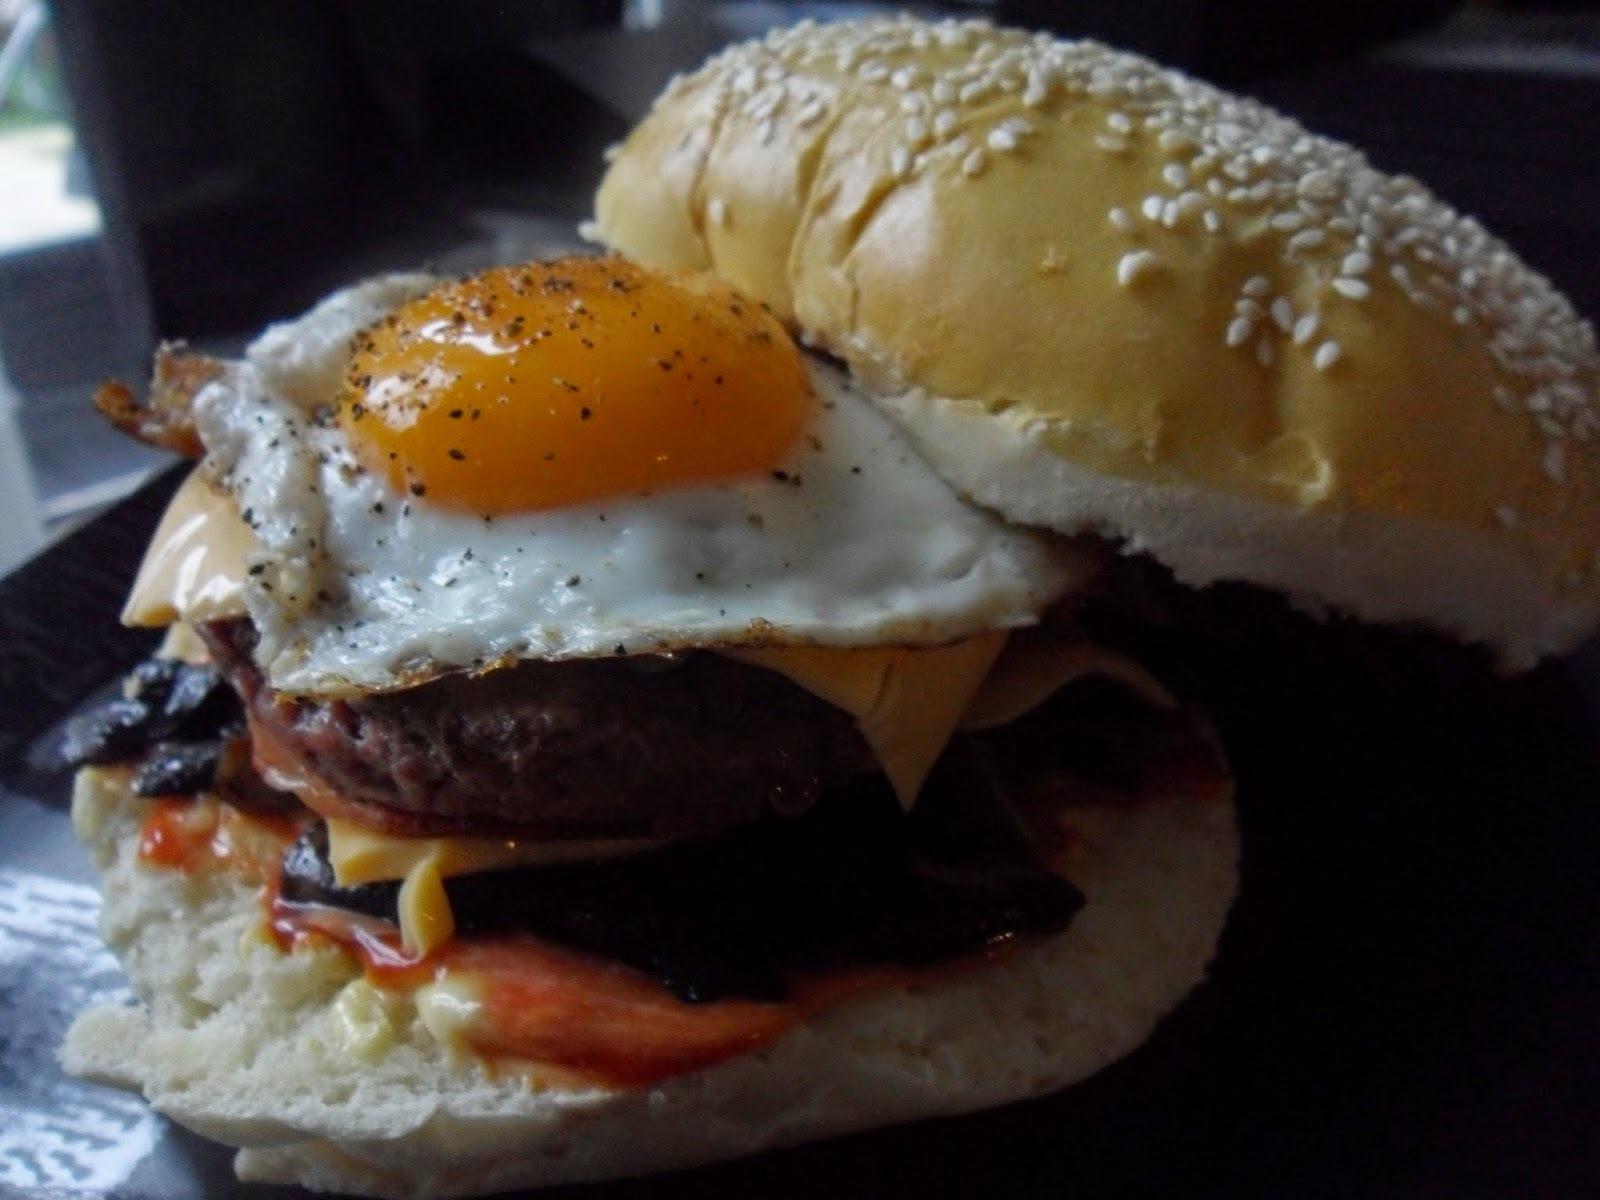 Hamburger maison au bœuf, bacon, champignons (2 gros hamburgers)